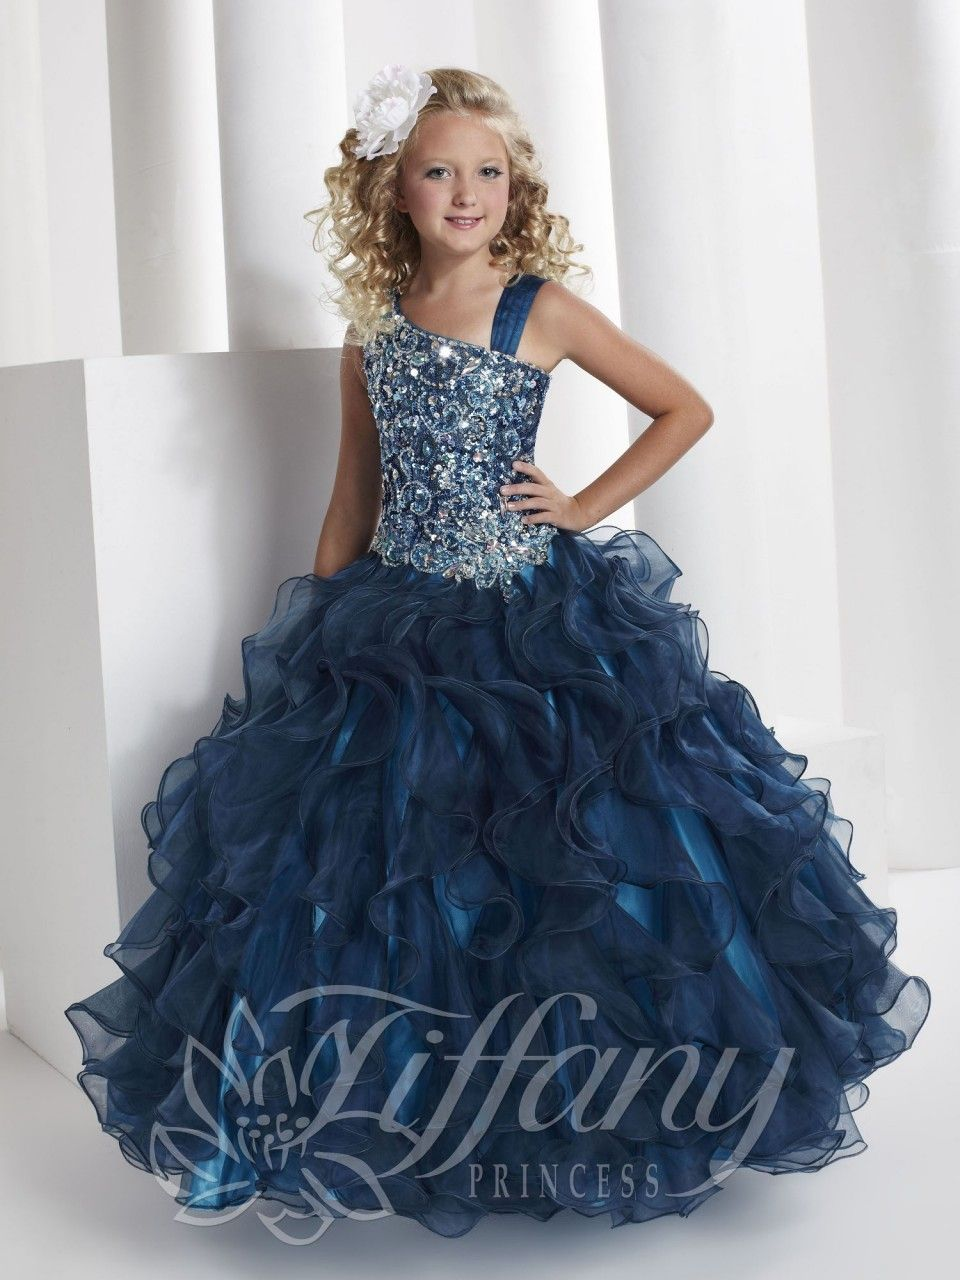 Glitz pageant dresses for rent - Blush Kids Inc Tiffany Princess 13332 Girls Glitz Pageant Dress